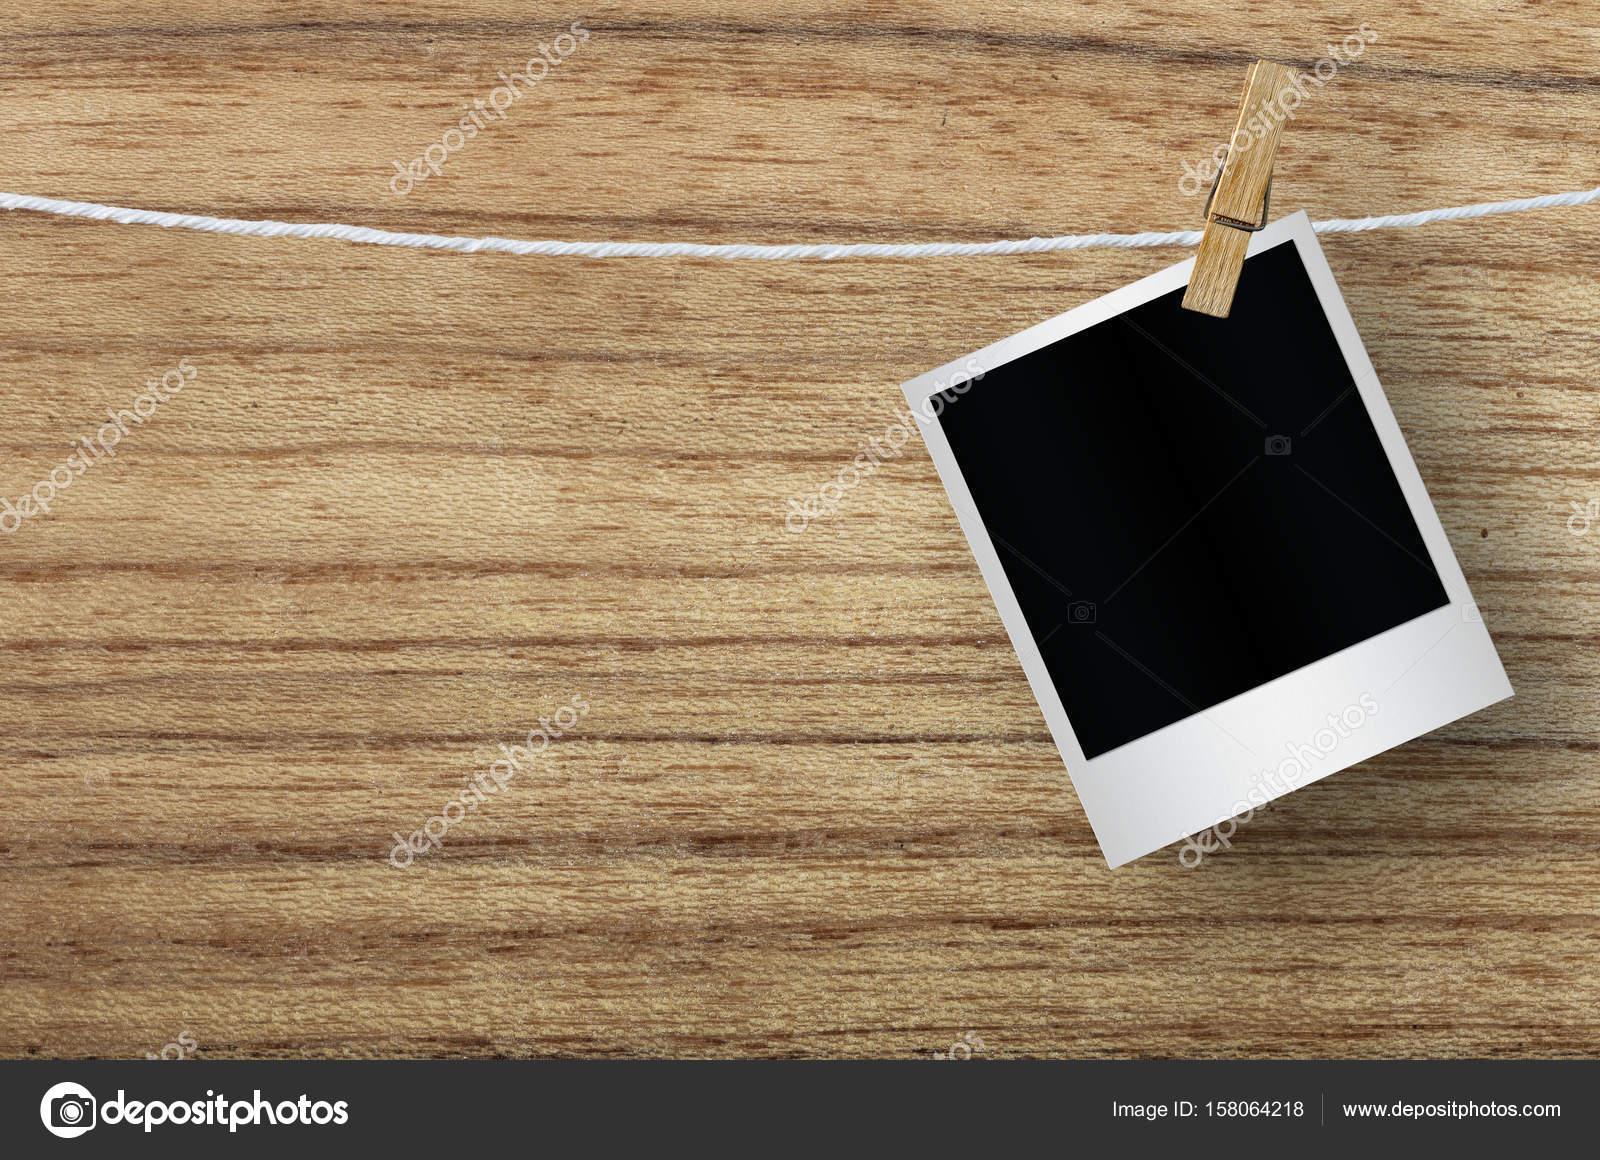 Leere Bilderrahmen mit Wäscheklammer — Stockfoto © nirutdps #158064218